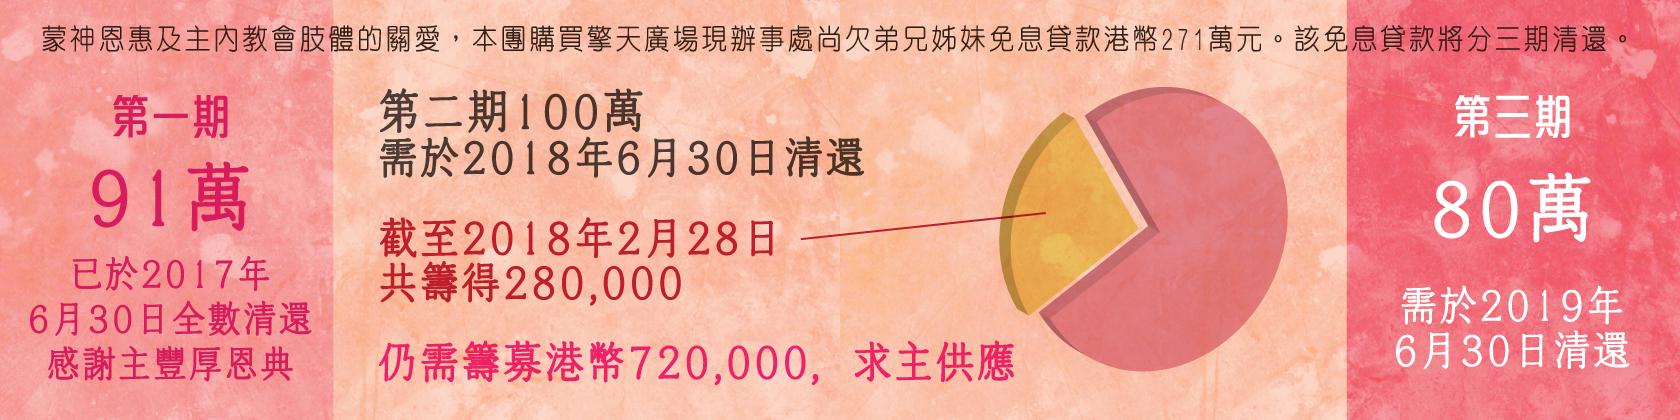 CB-02-web-banner-1680-x-420-07-2